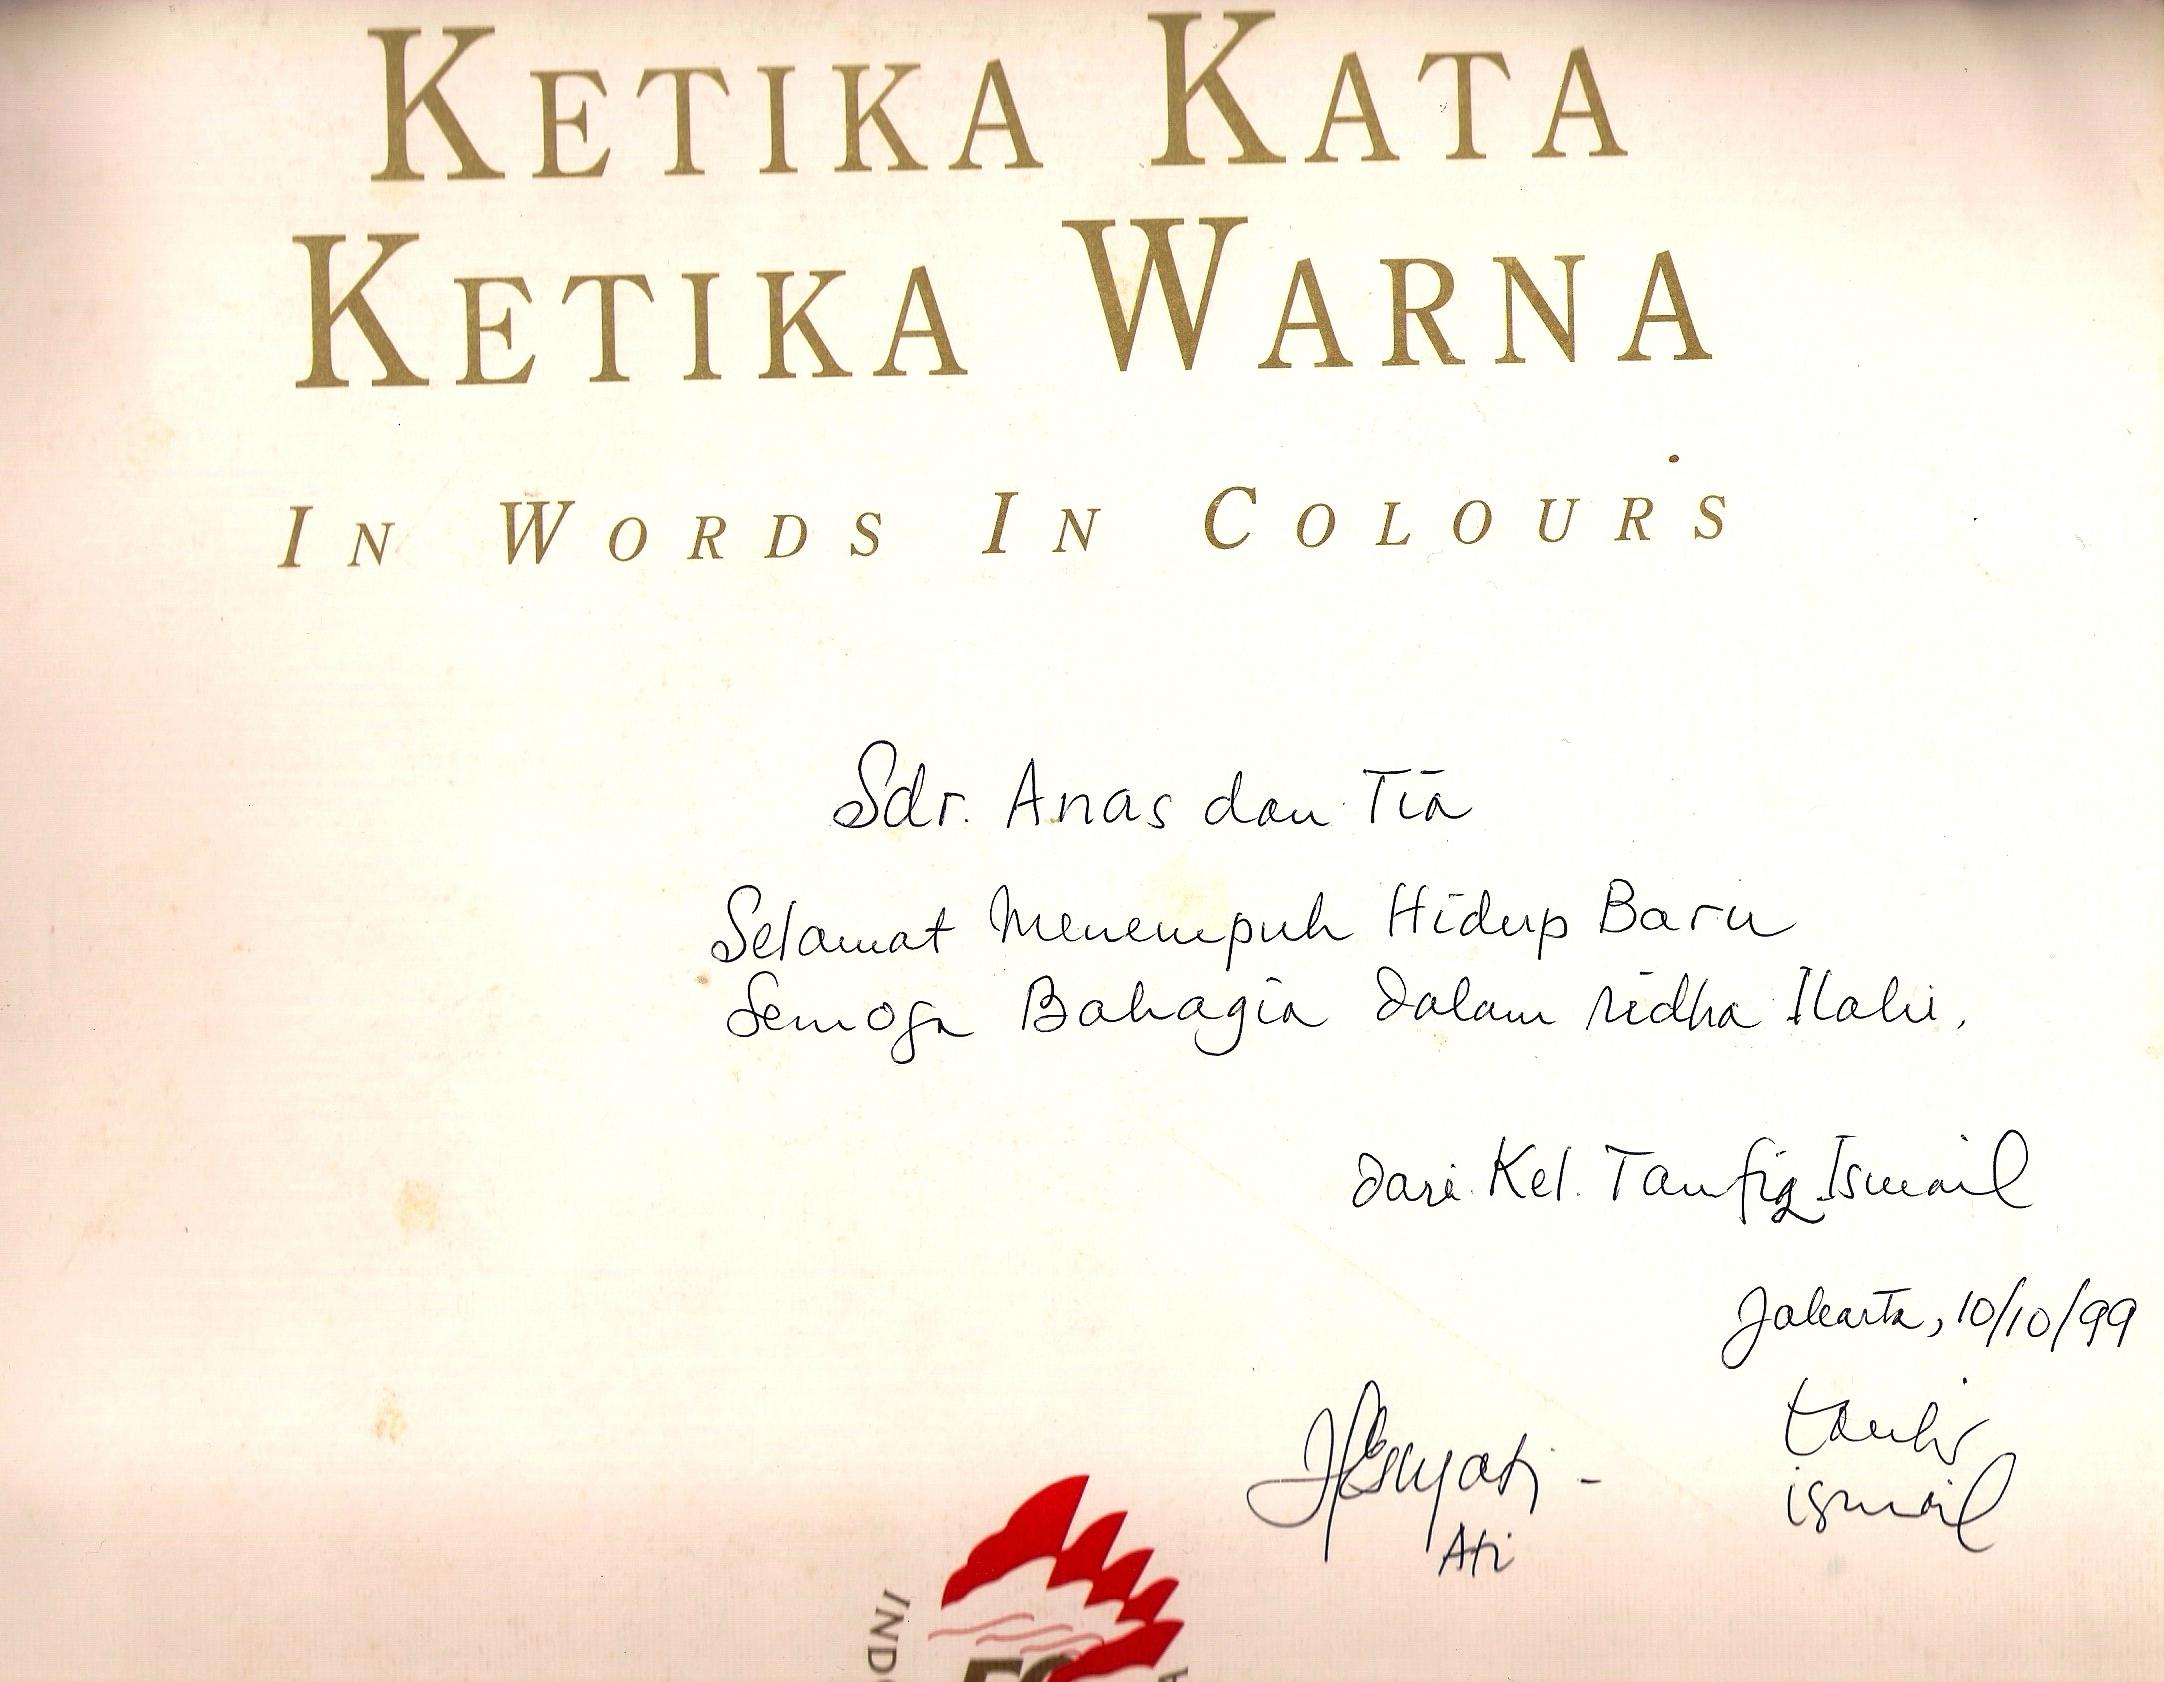 Menatap wajah sejarah kemerdekaan indonesia dalam puisi dan lukisan (1